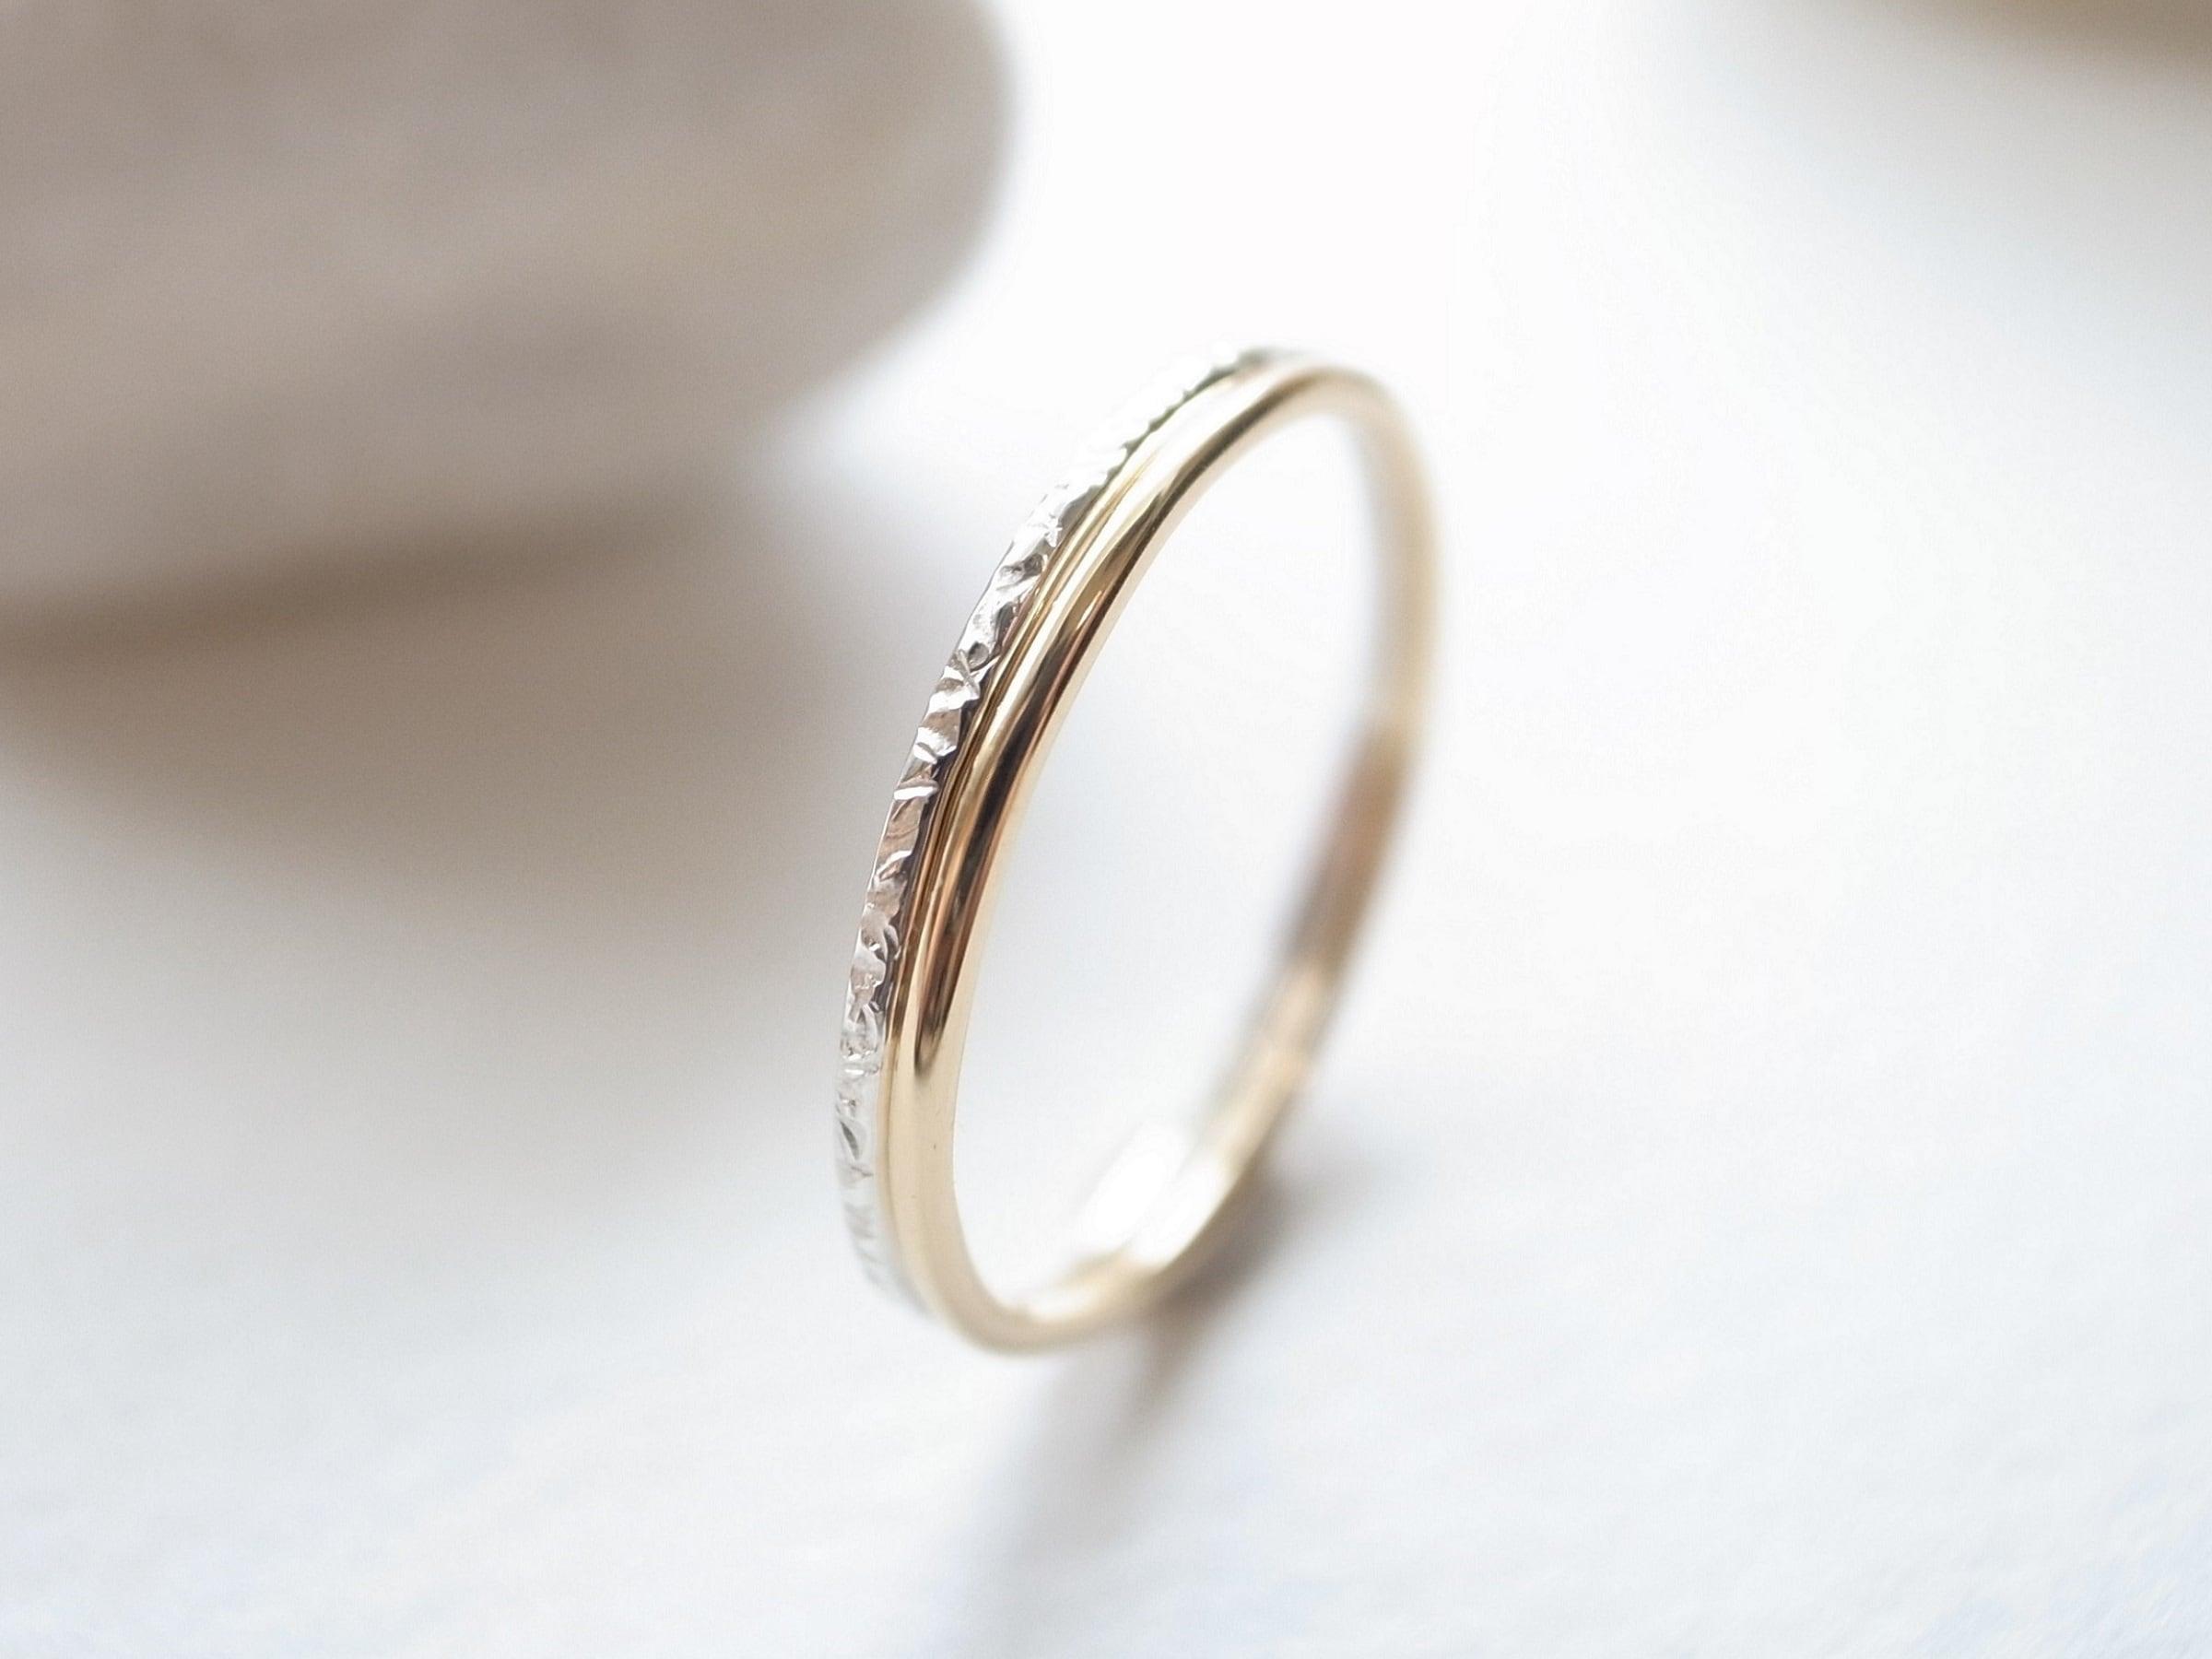 【set ring】K18YG/plain & silver950/stardust